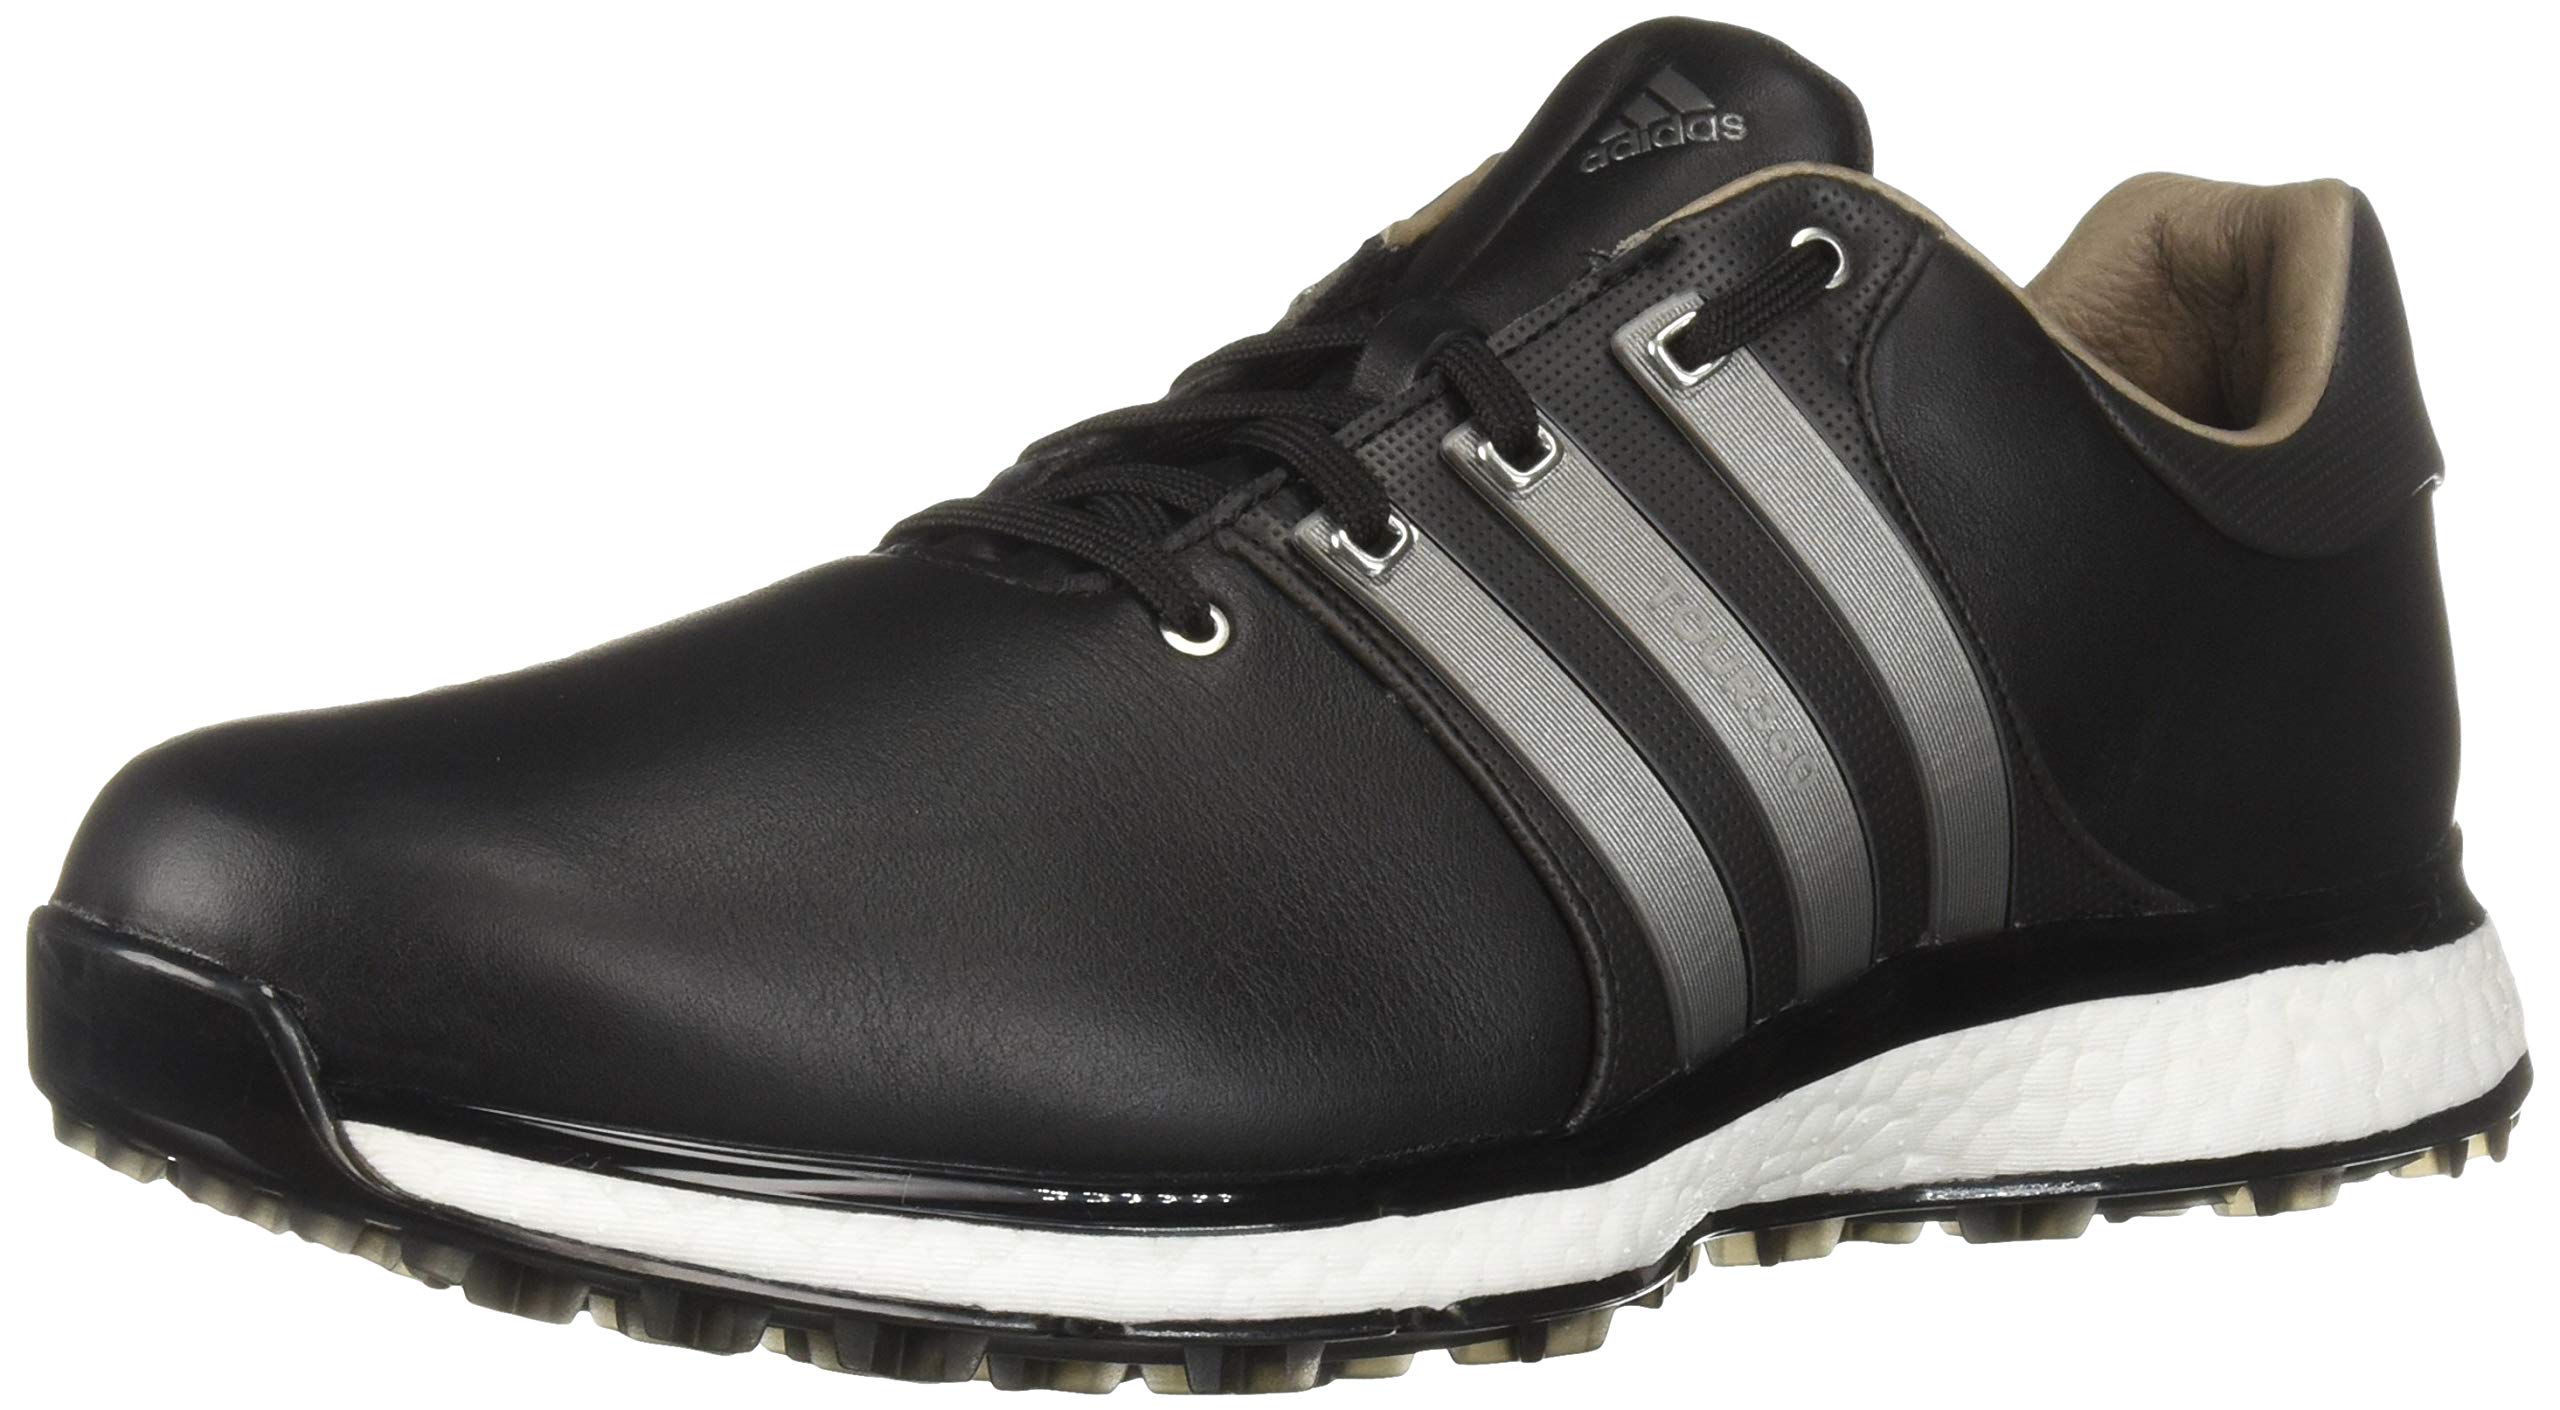 adidas Men's TOUR360 XT Spikeless Golf Shoe core Black/Iron Silver Metallic, 7 M US